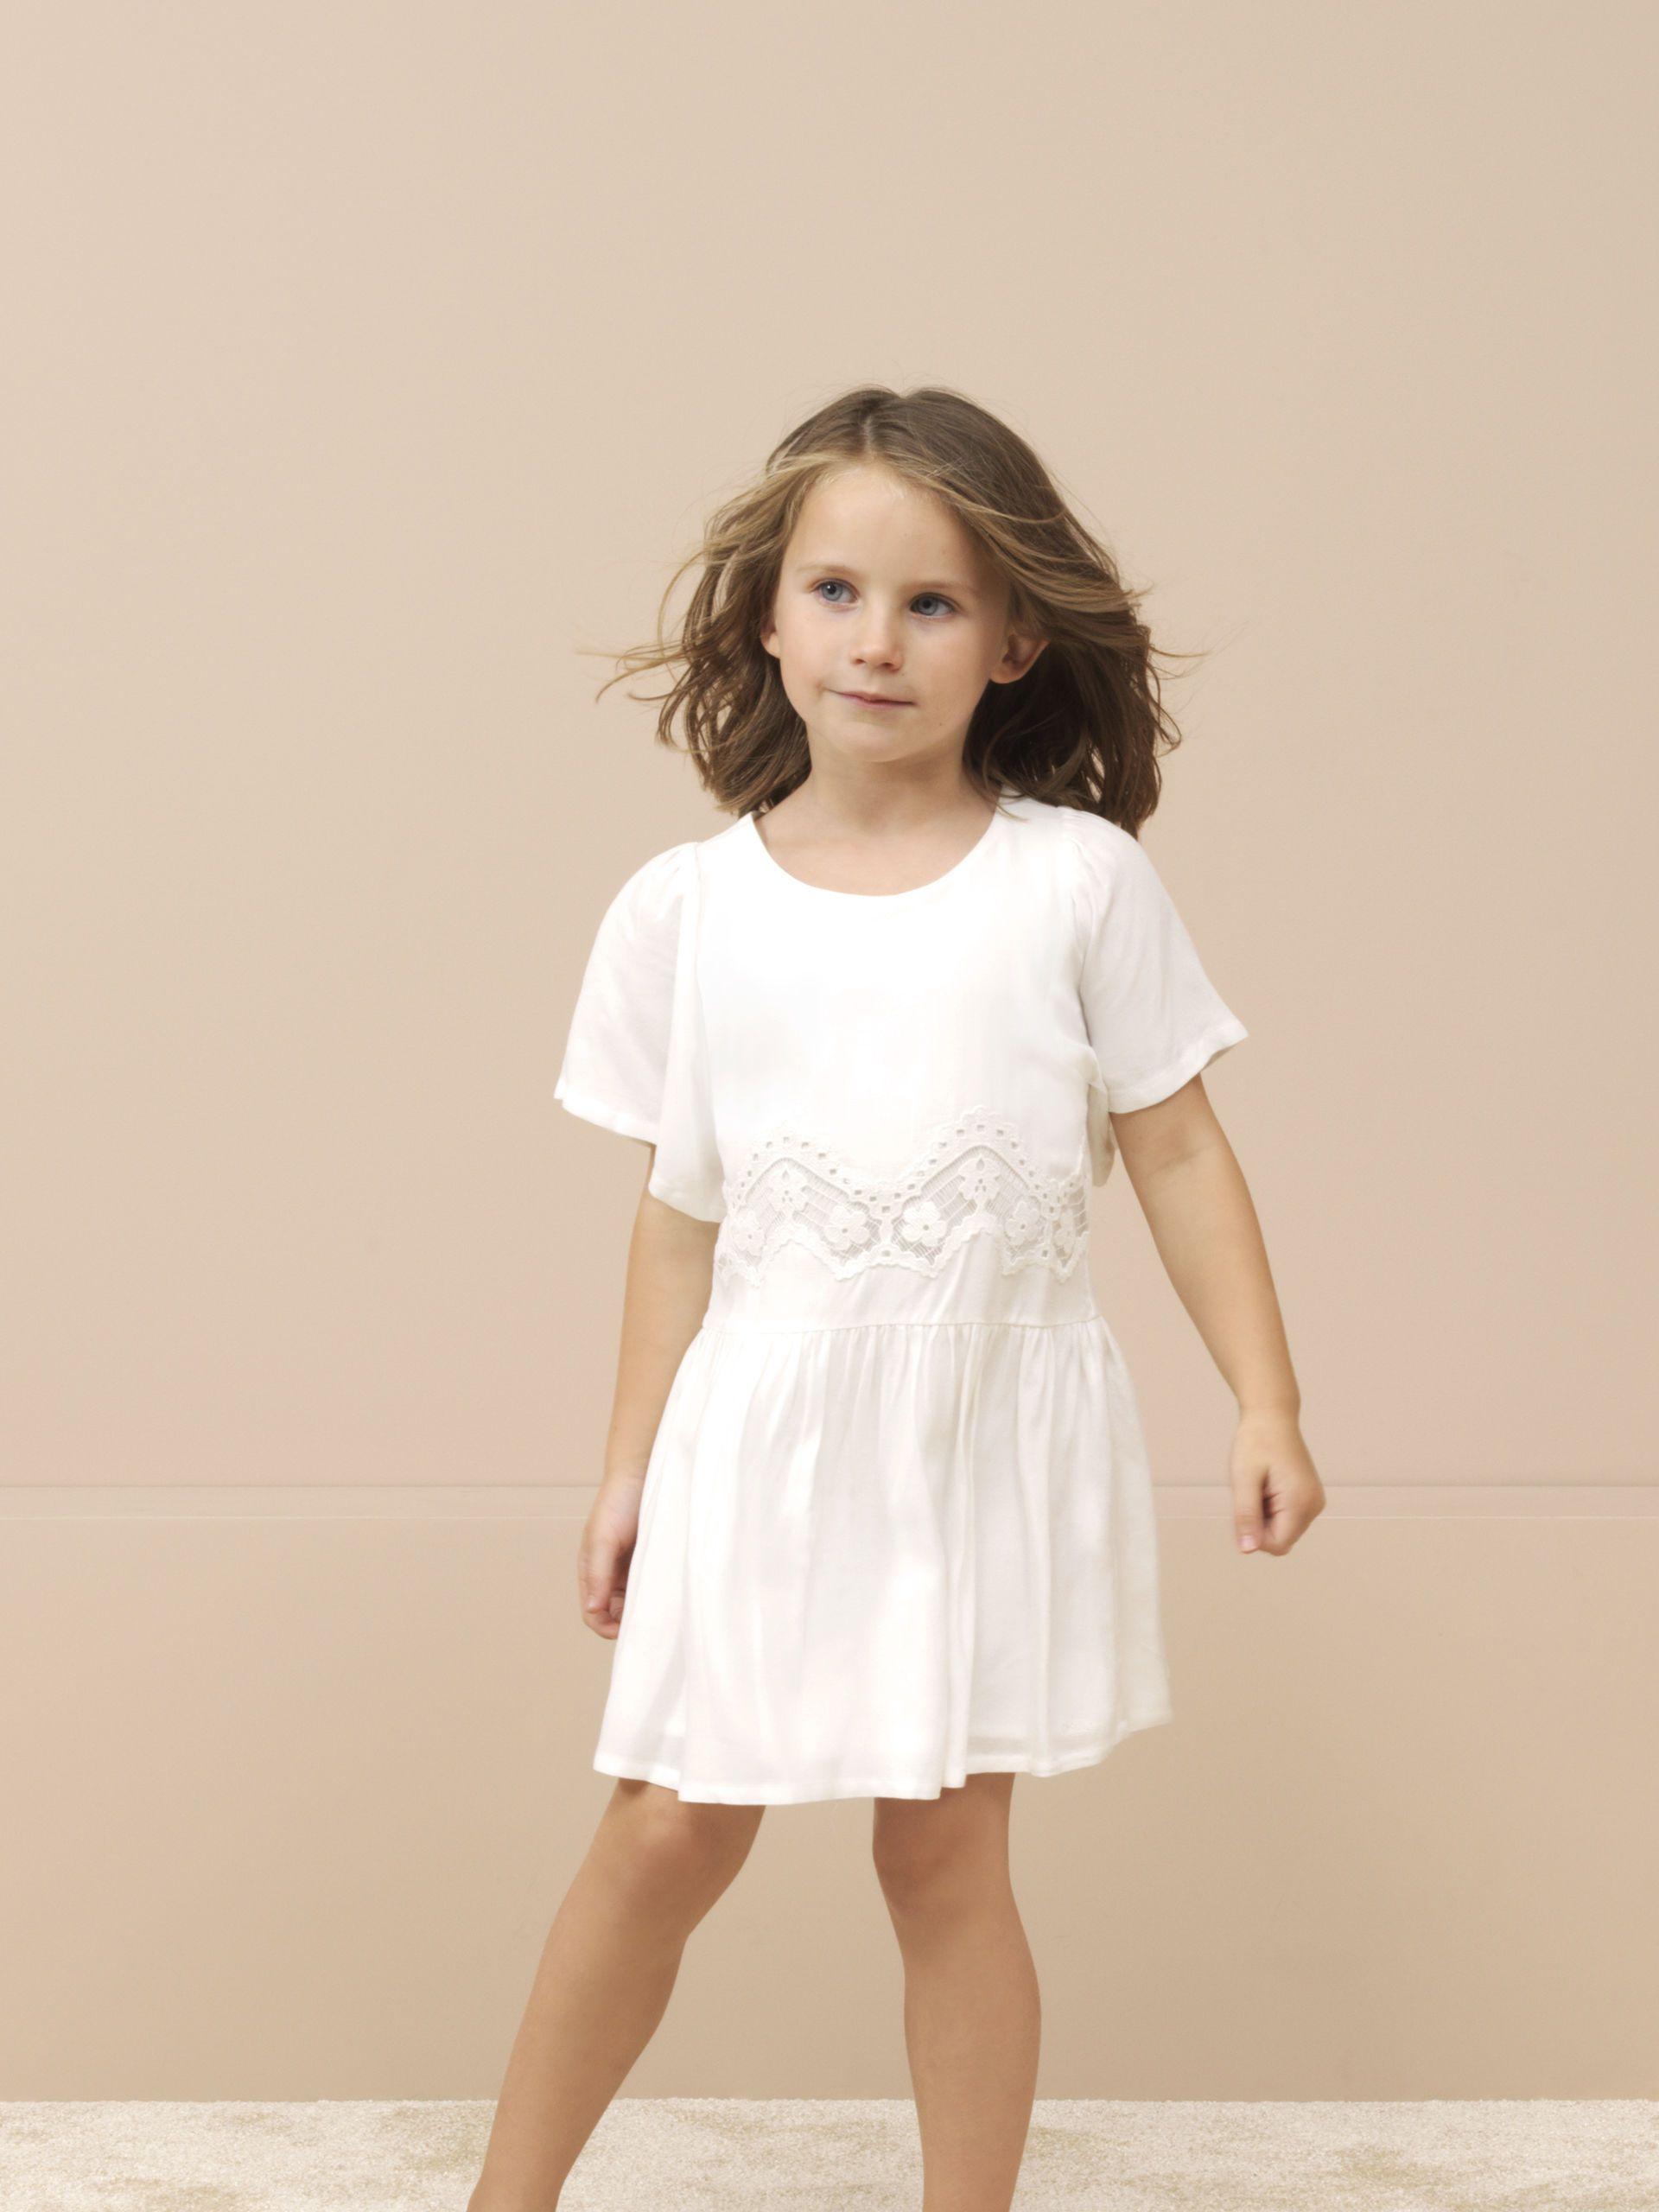 Basic White Dress Chloe Kids 2017 Vestido Basico Branco Chloe Kids 2017 Kids Fashion Fashion Embellished Dress [ 2560 x 1920 Pixel ]